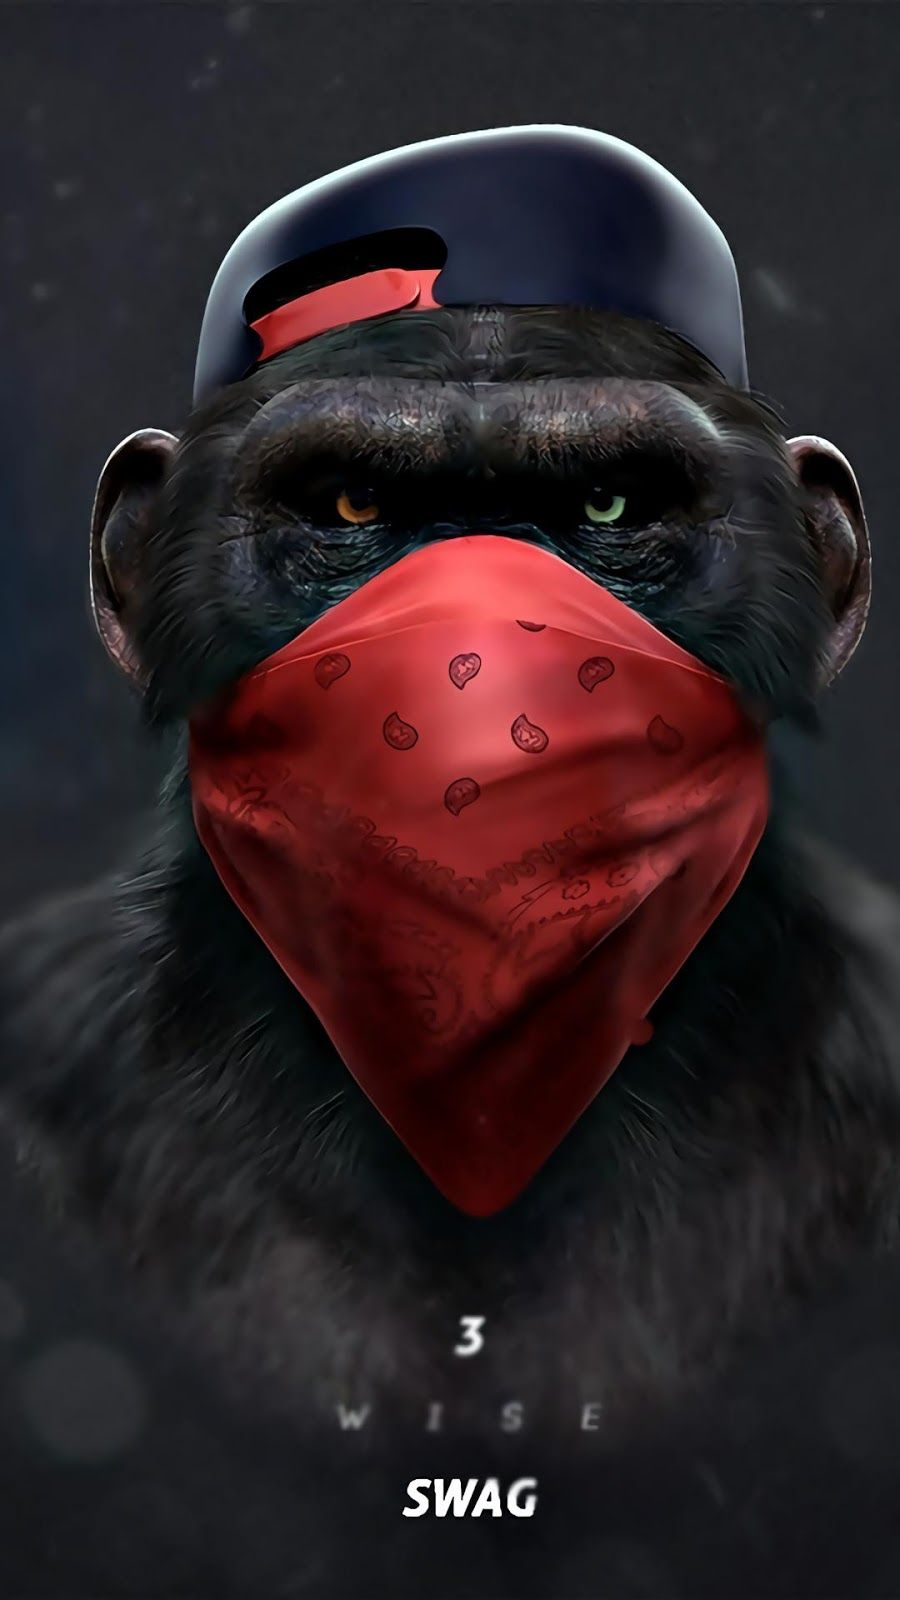 monkey swag mobile wallpaper marvel fondos de pantalla fondos rh ar pinterest com